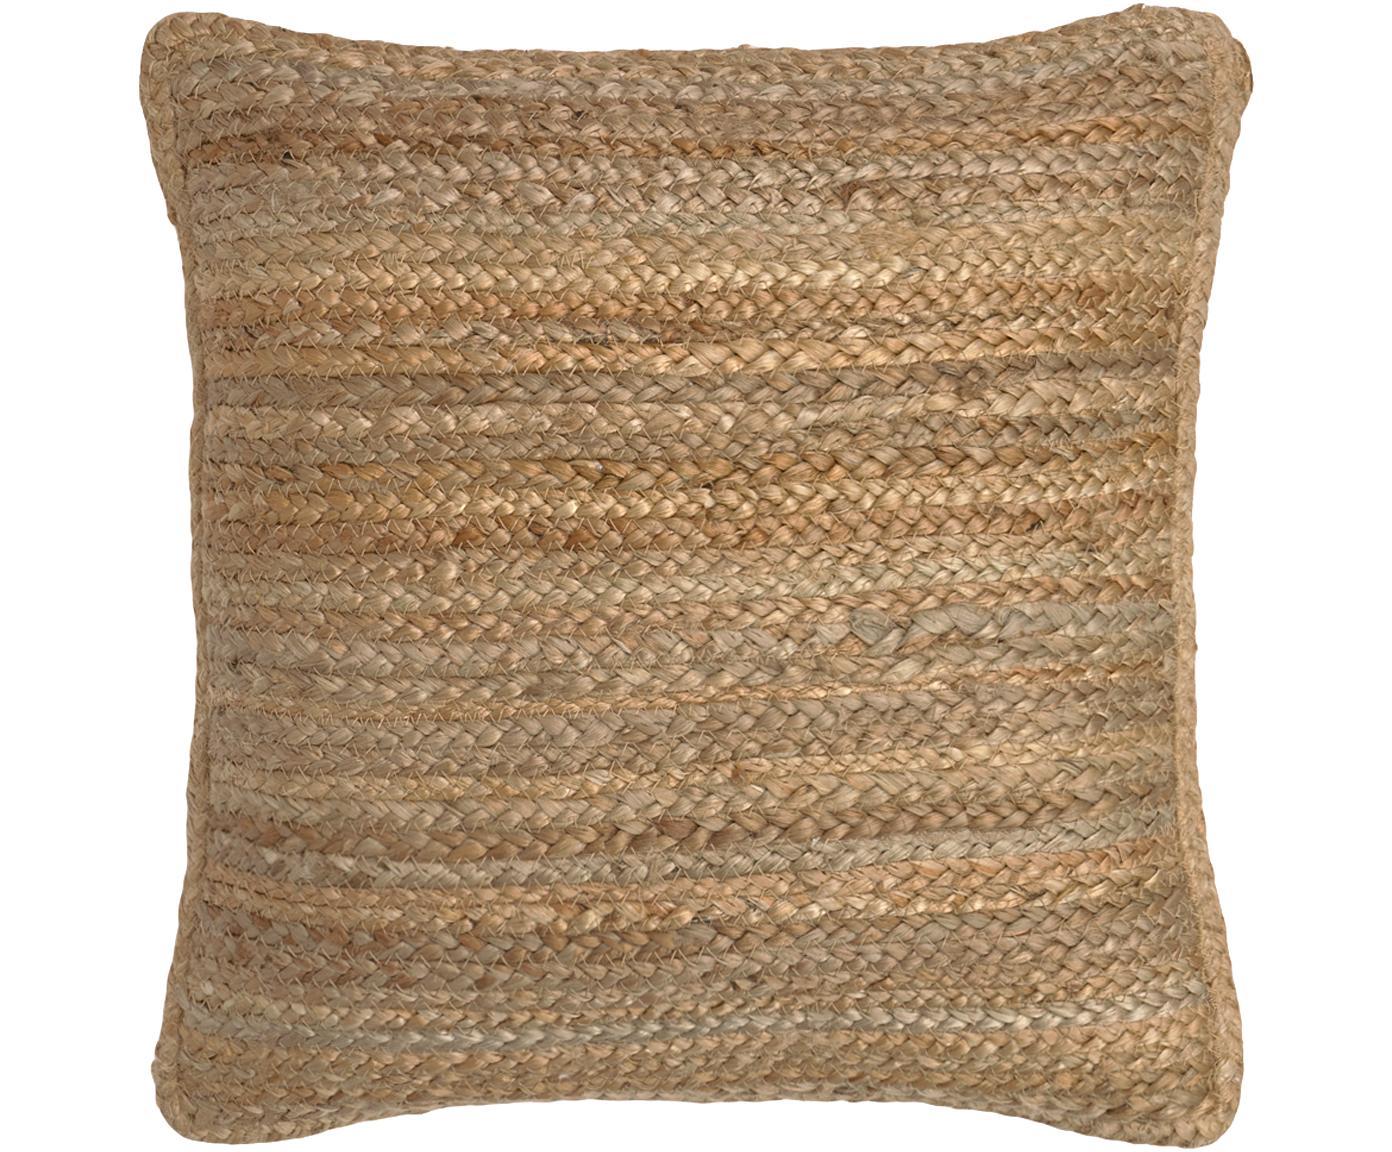 Jute-Kissenhülle Ural, Vorderseite: Jute, Rückseite: Baumwolle, Jute, 45 x 45 cm